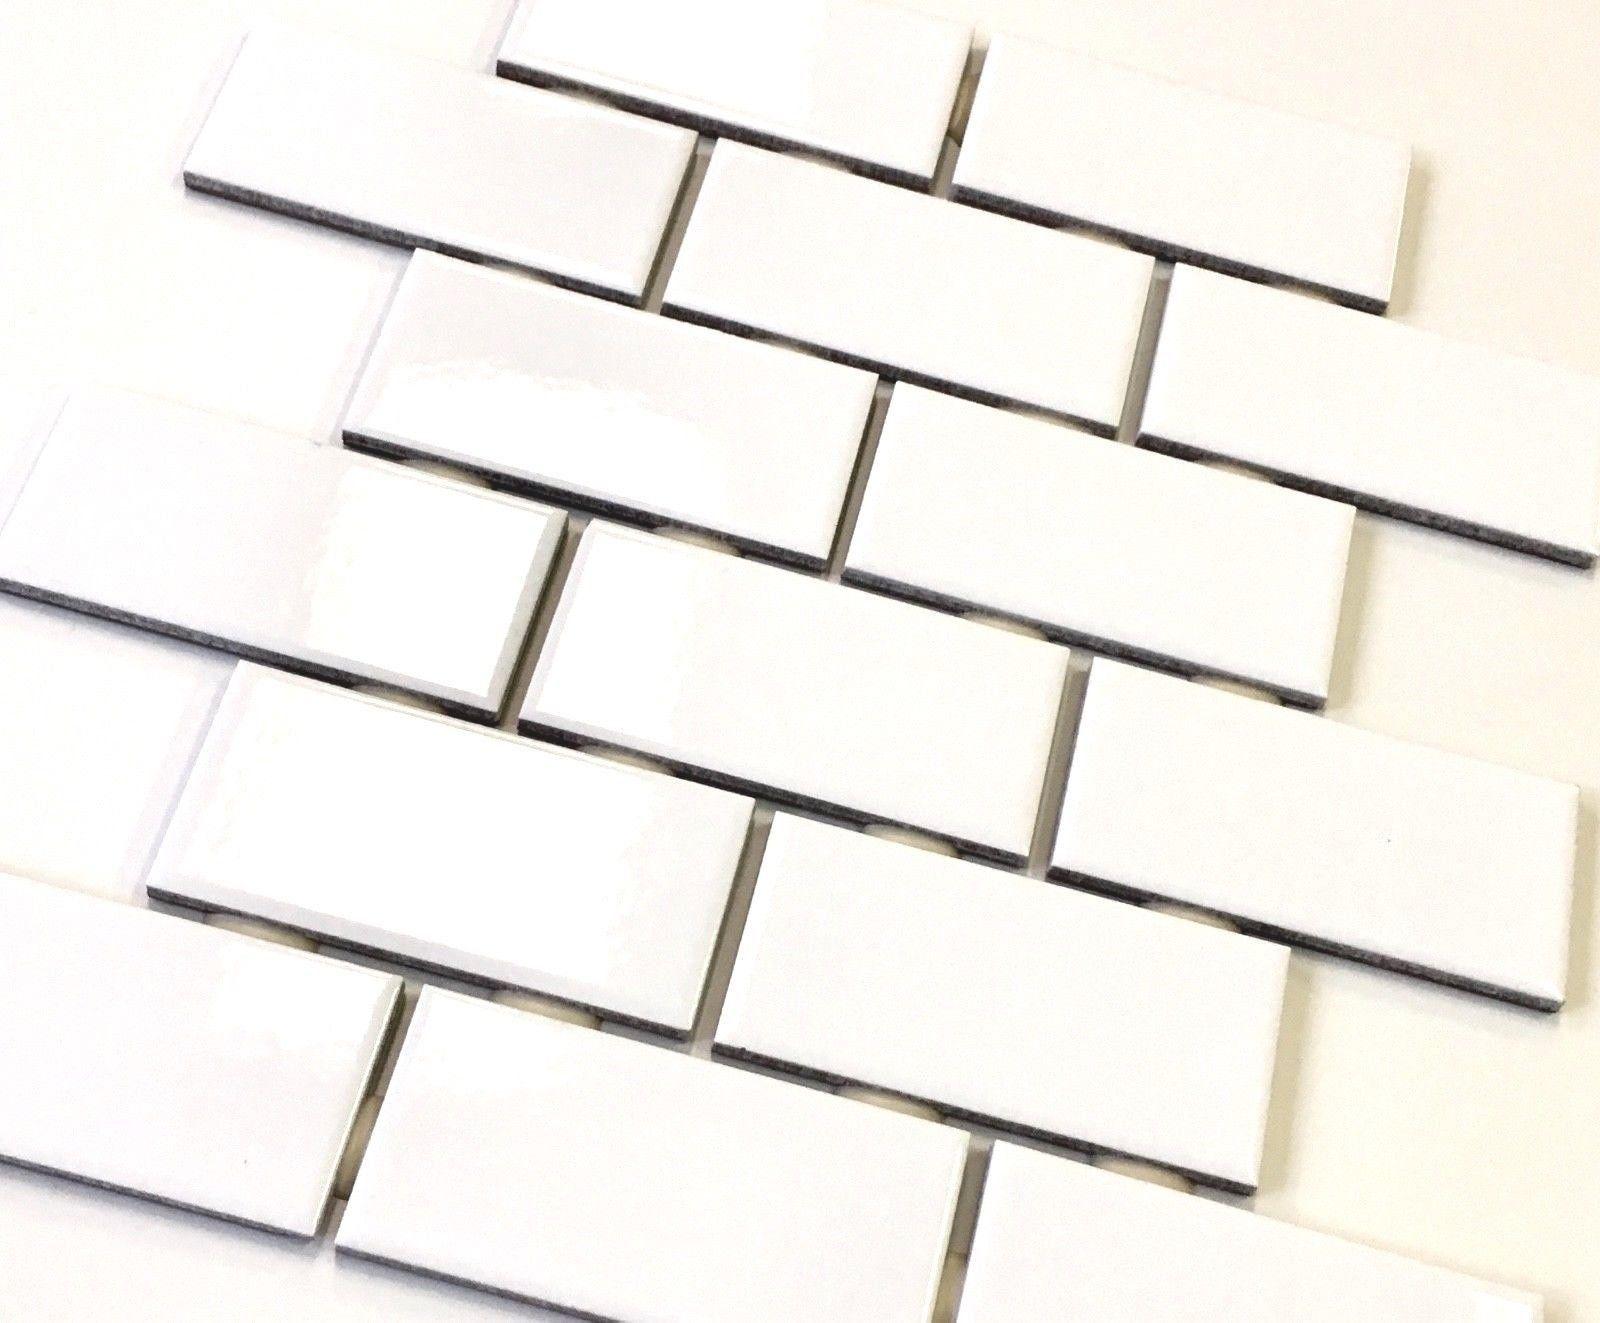 2x4 White Subway Glossy Ceramic Tile Kitchen Backsplash Bathroom 1 Sheet To View Additional Bathroom Backsplash Kitchen Tiles Backsplash Kitchen Backsplash